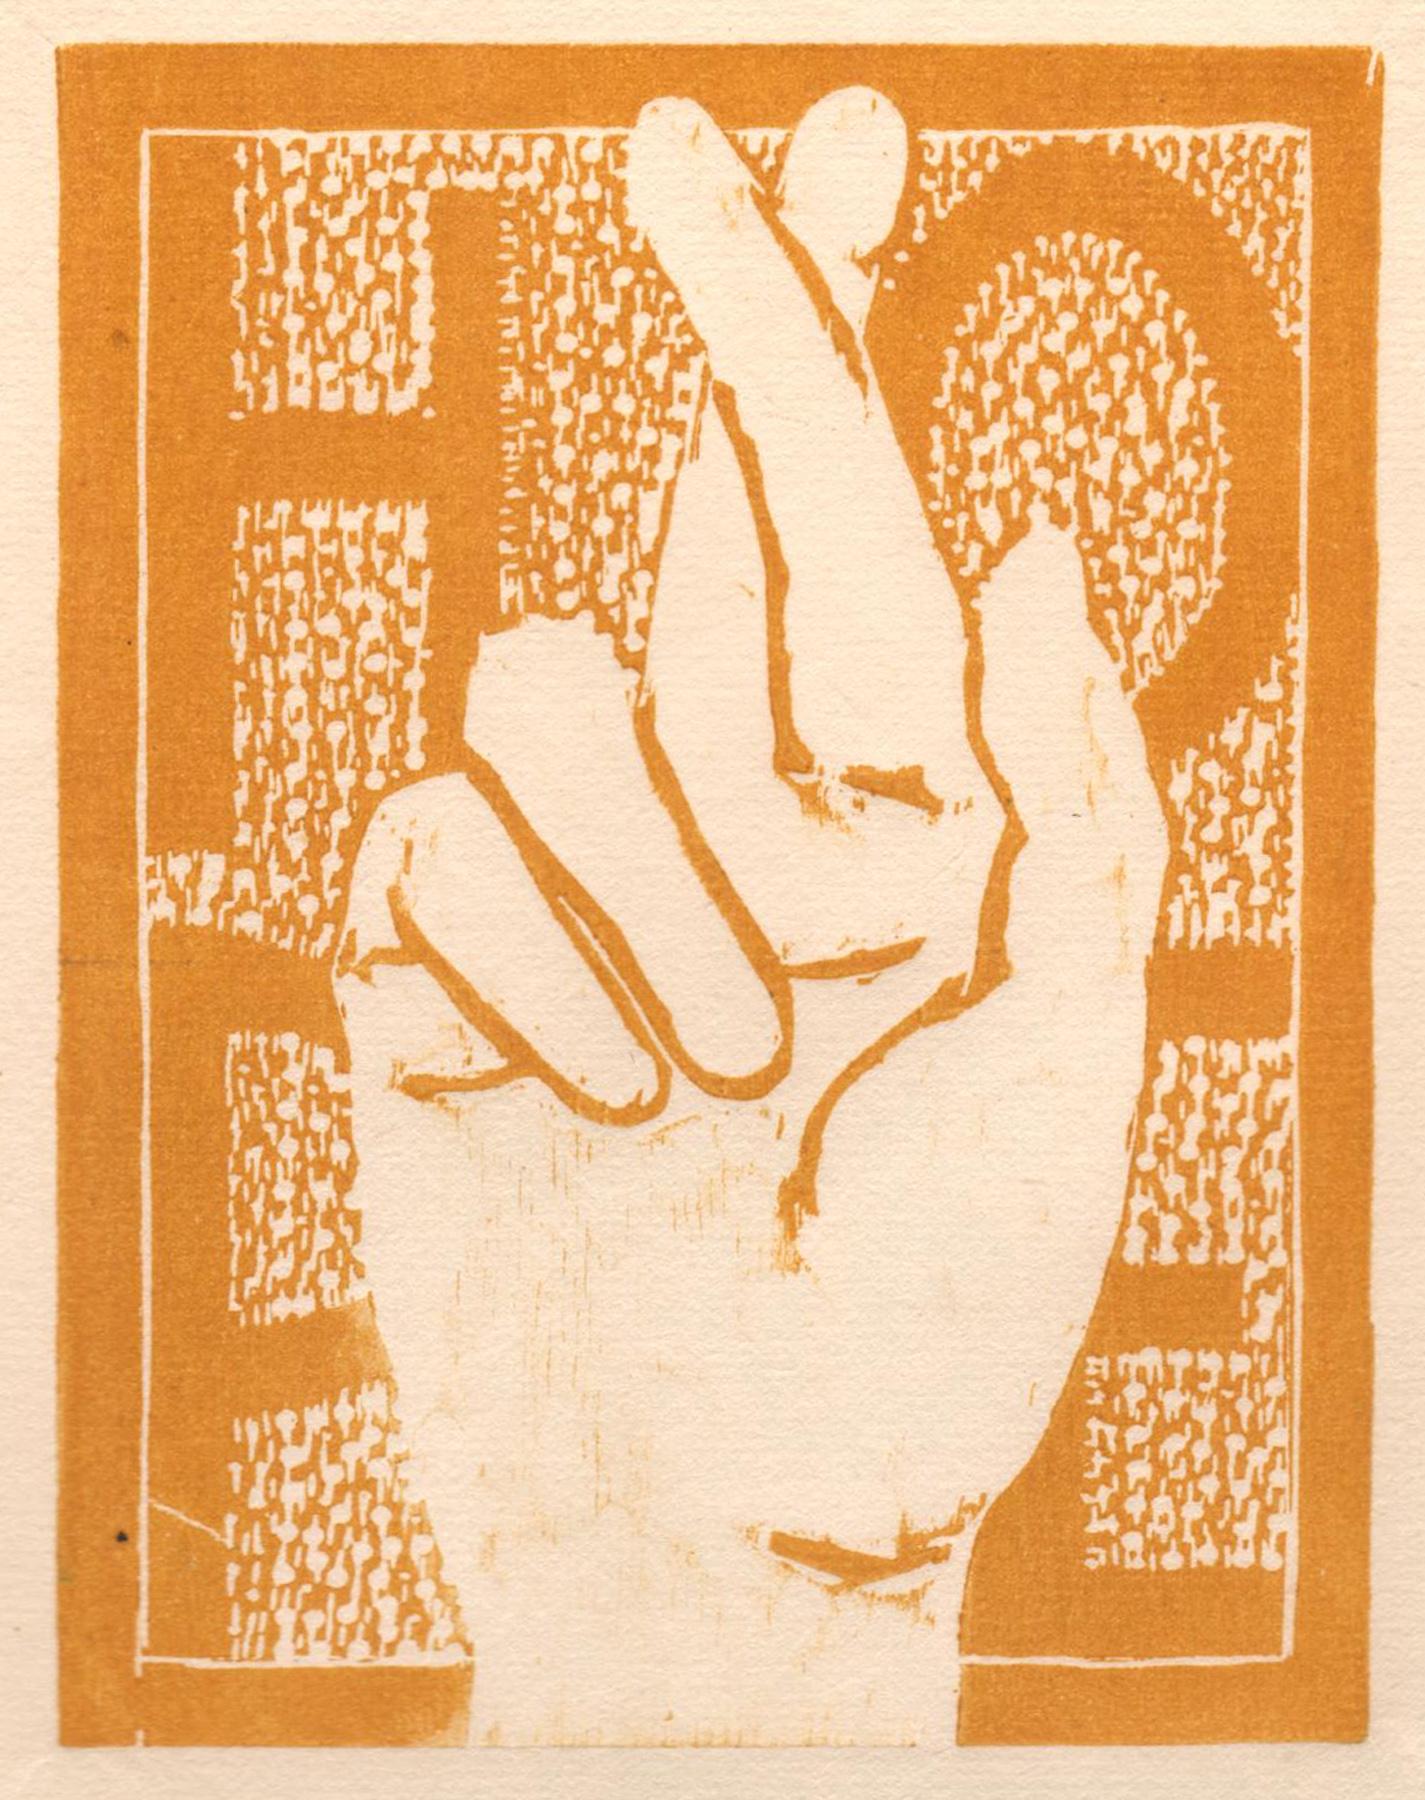 "'Helping Hands, Hope', woodcut, 6.5"" x 5"", $80 unframed"